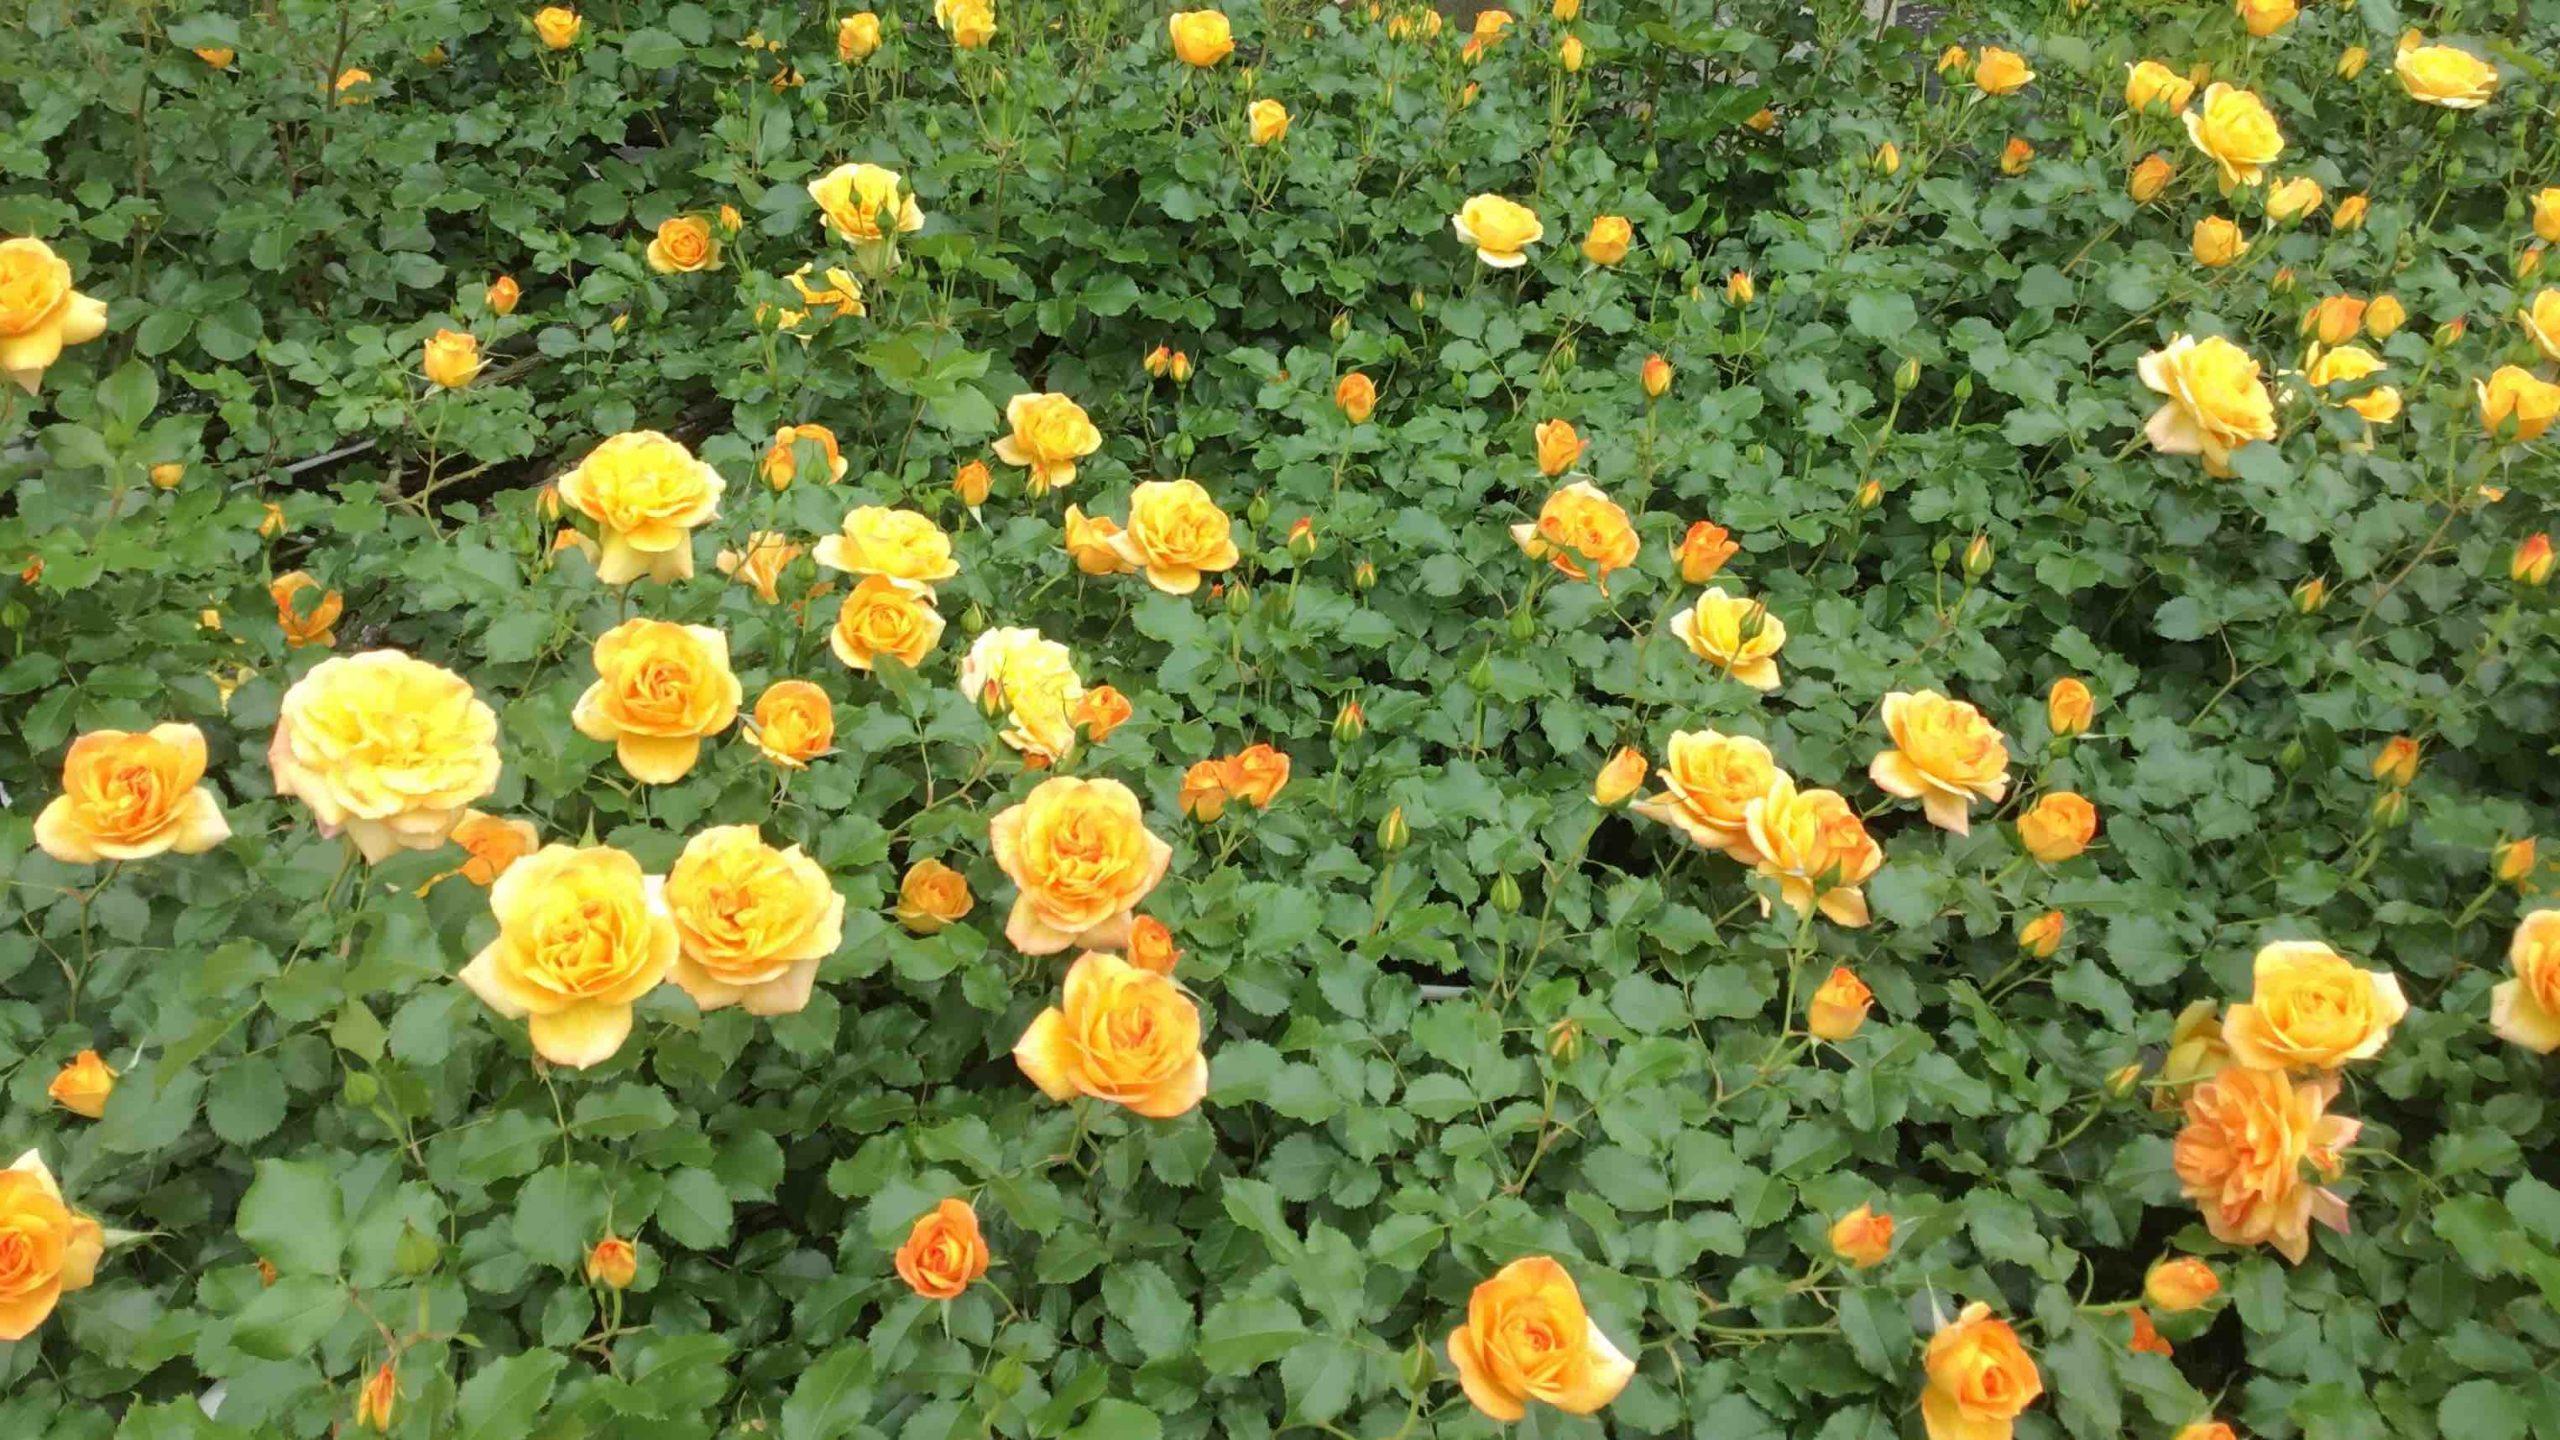 roses-yellow